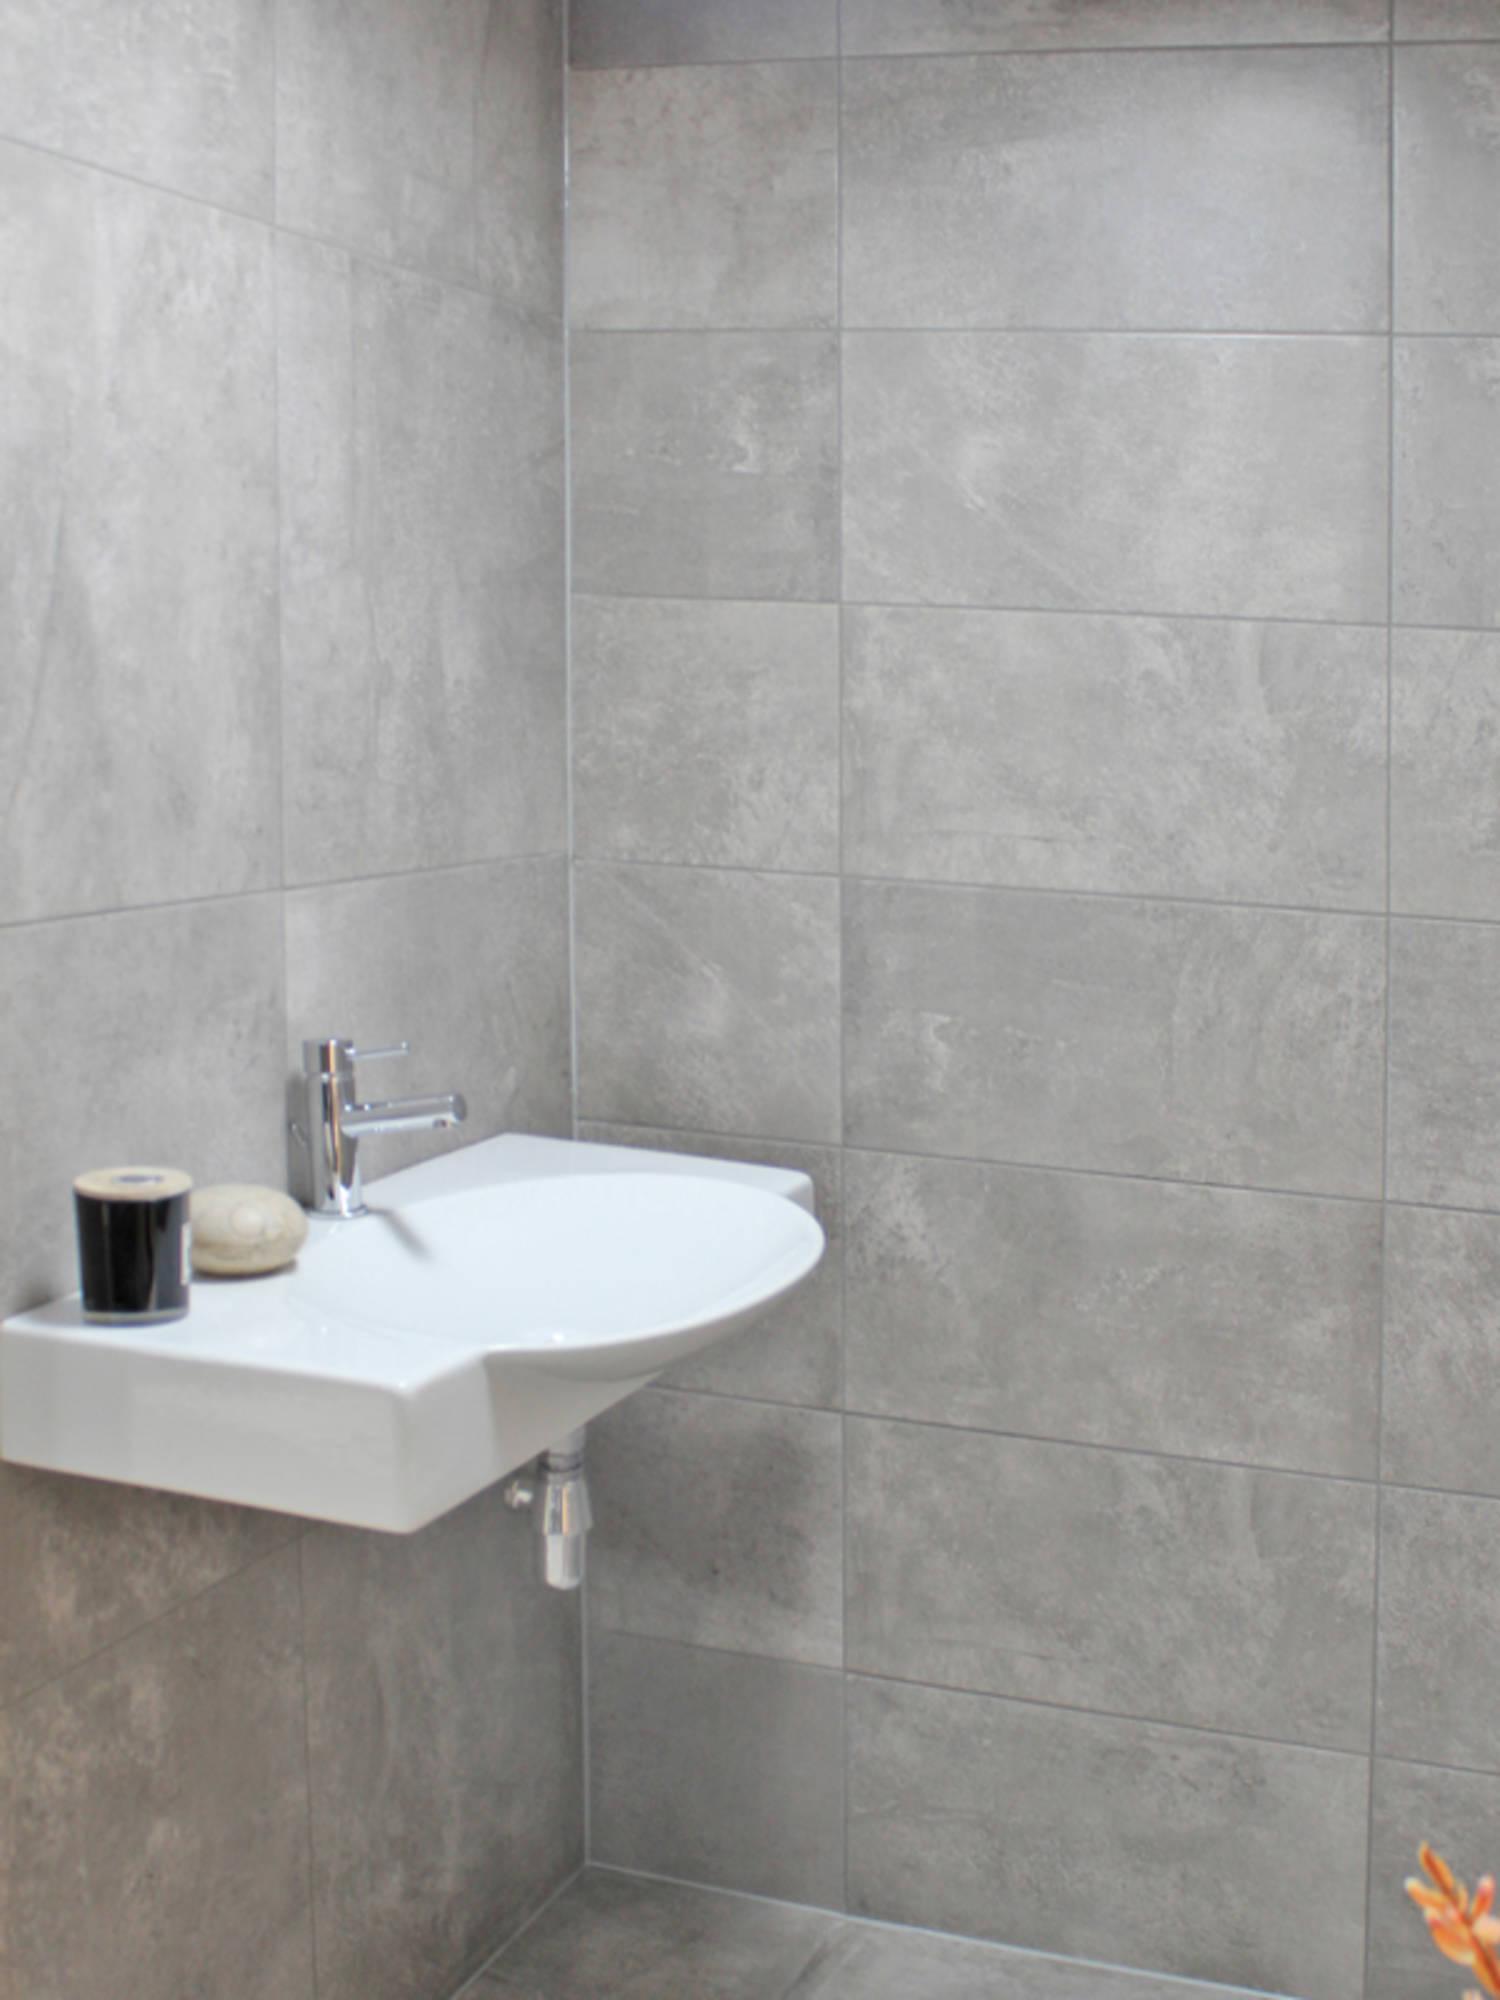 Vloertegel Imola Concrete Project 60x60x- cm Grey G Lp 1,08M2